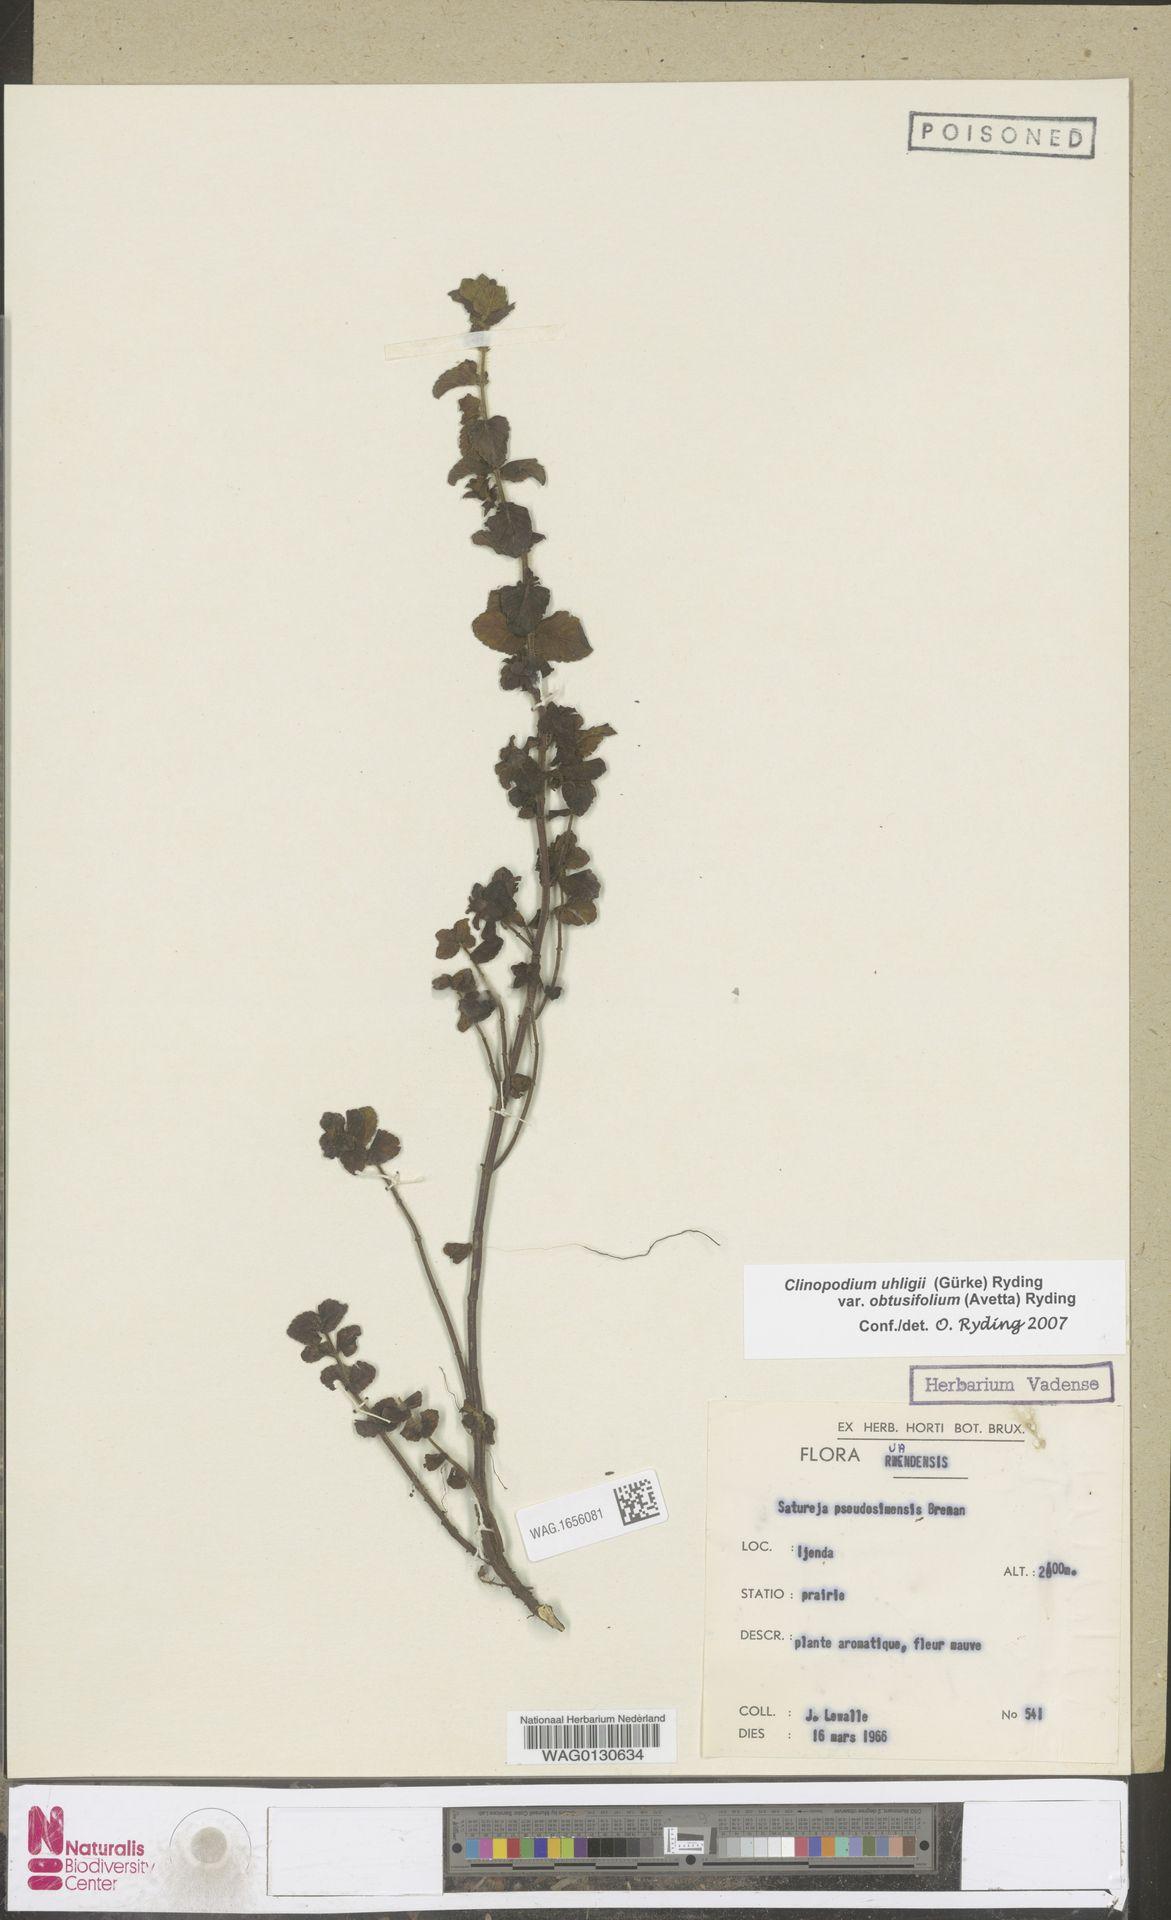 WAG.1656081 | Clinopodium uhligii var. obtusifolium (Avetta) Ryding